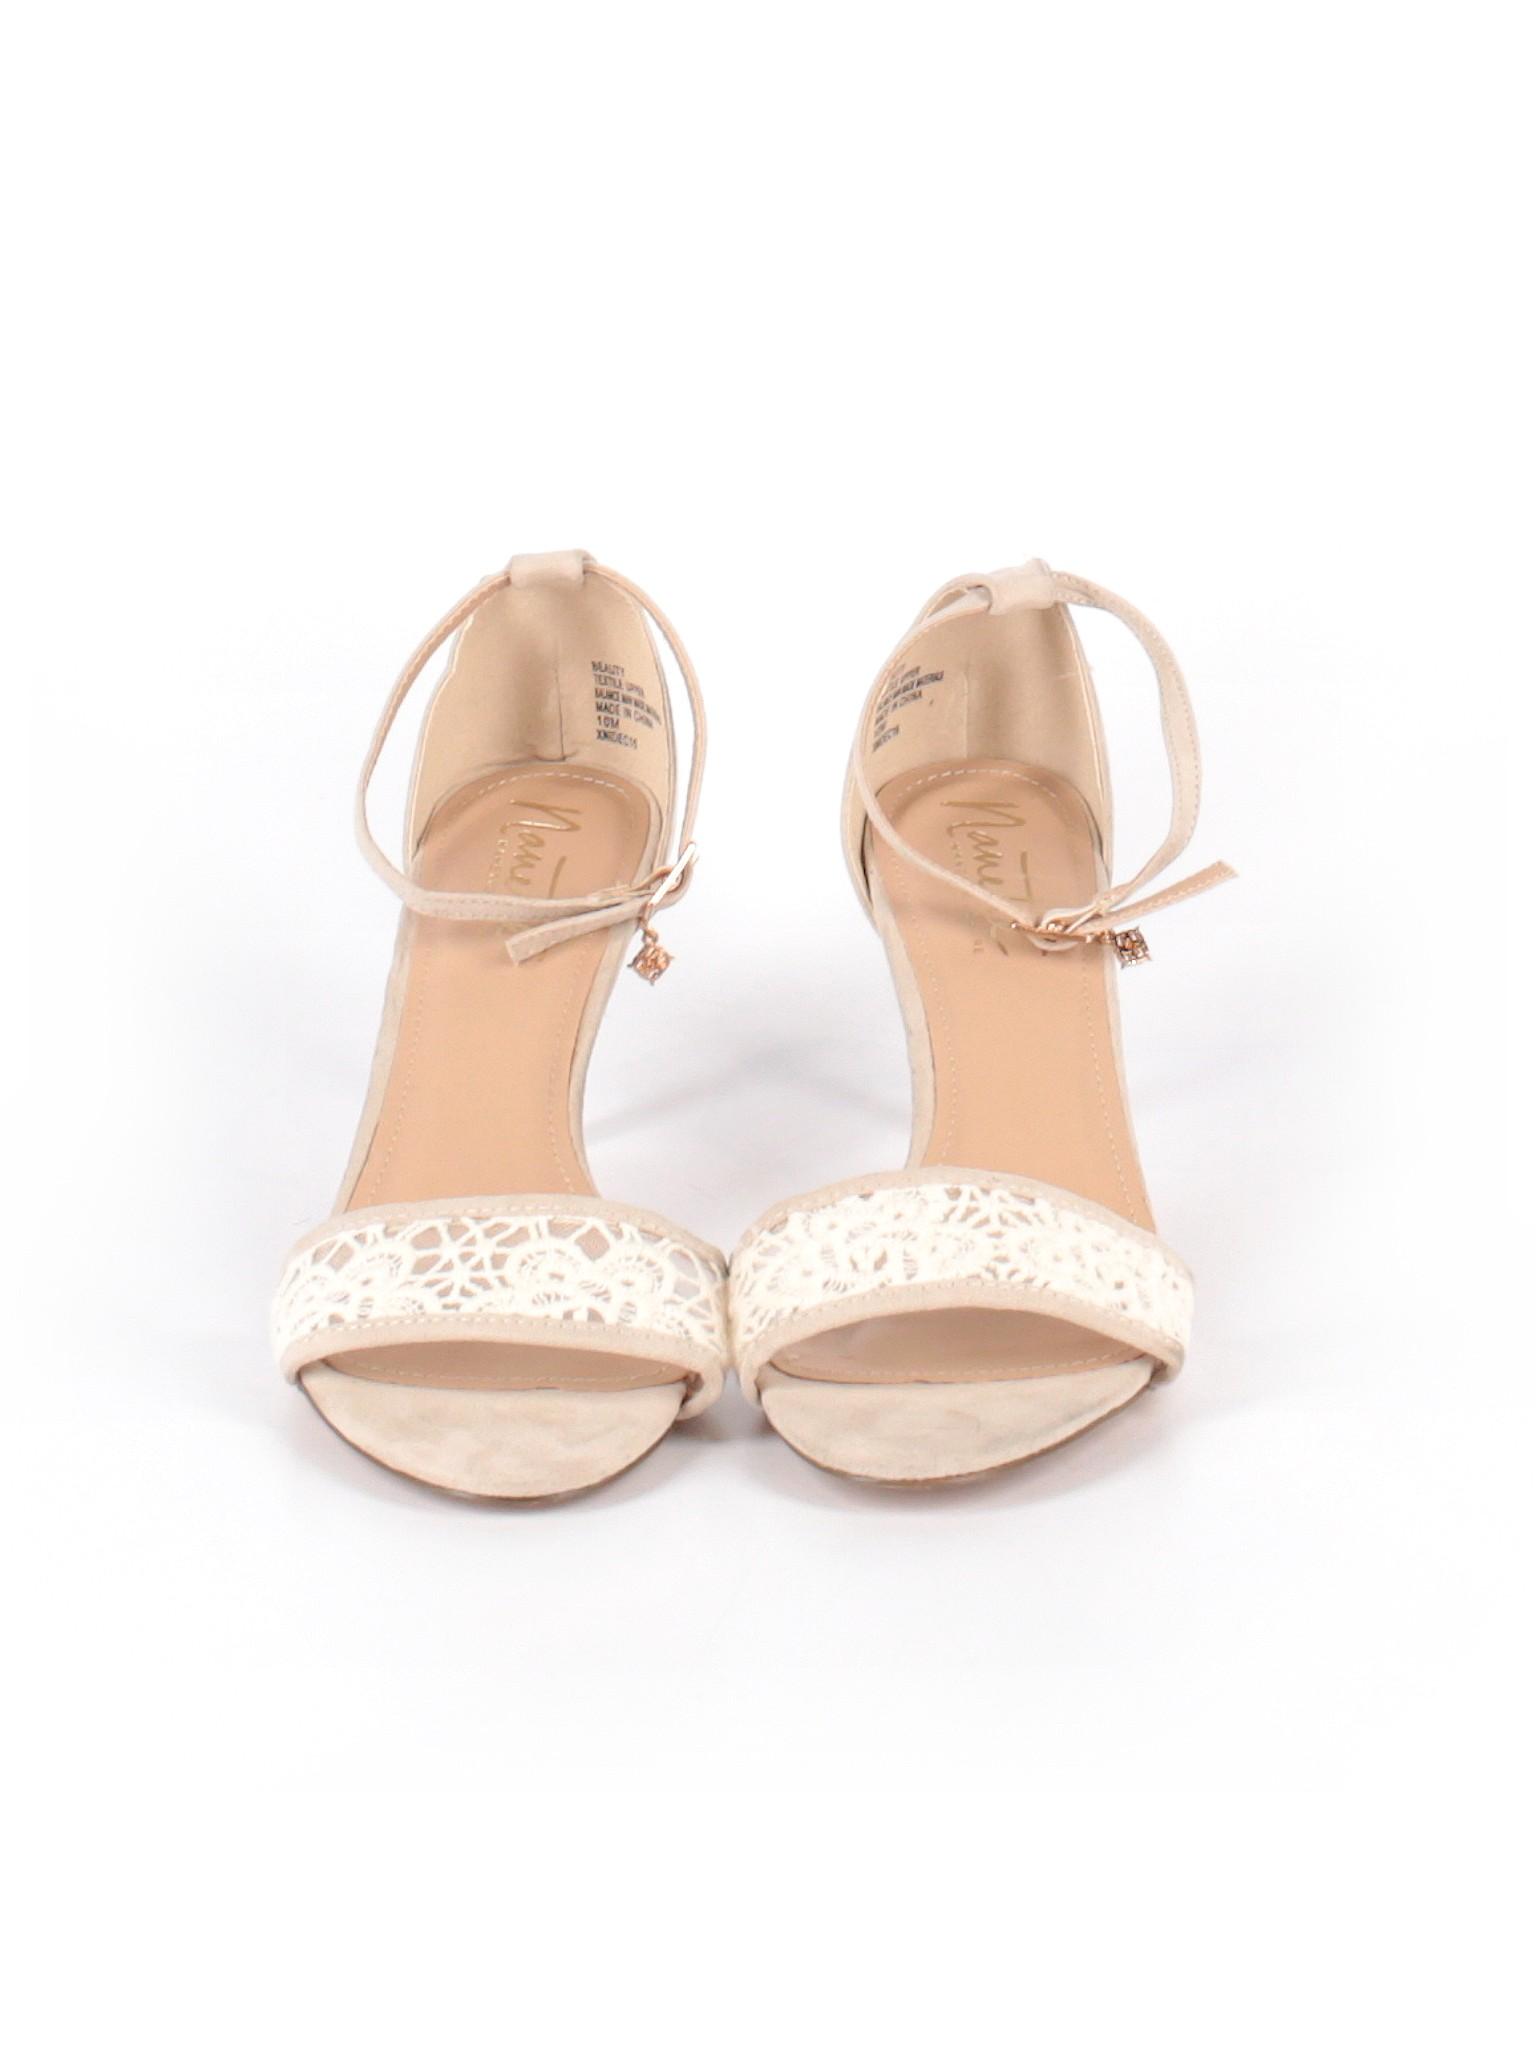 Boutique Heels Nanette NANETTE promotion Lepore rxHw4rn